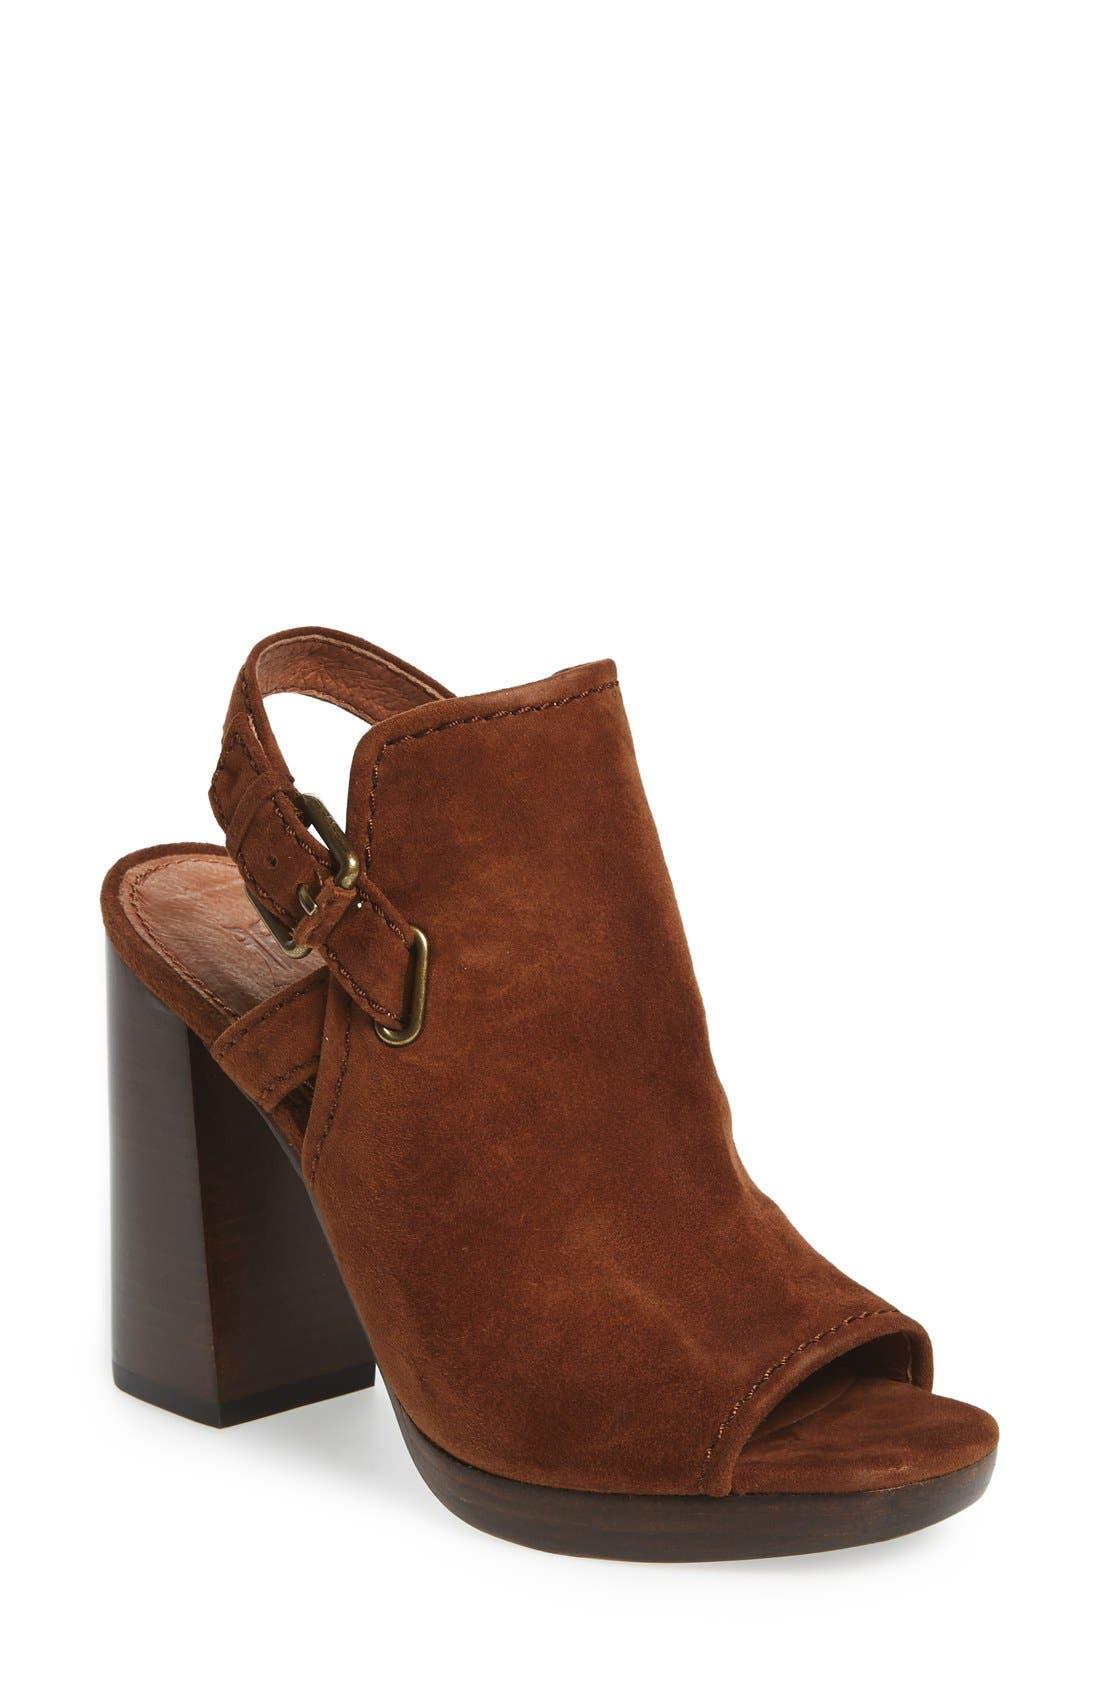 Main Image - Frye 'Karissa Shield' Sandal (Women)